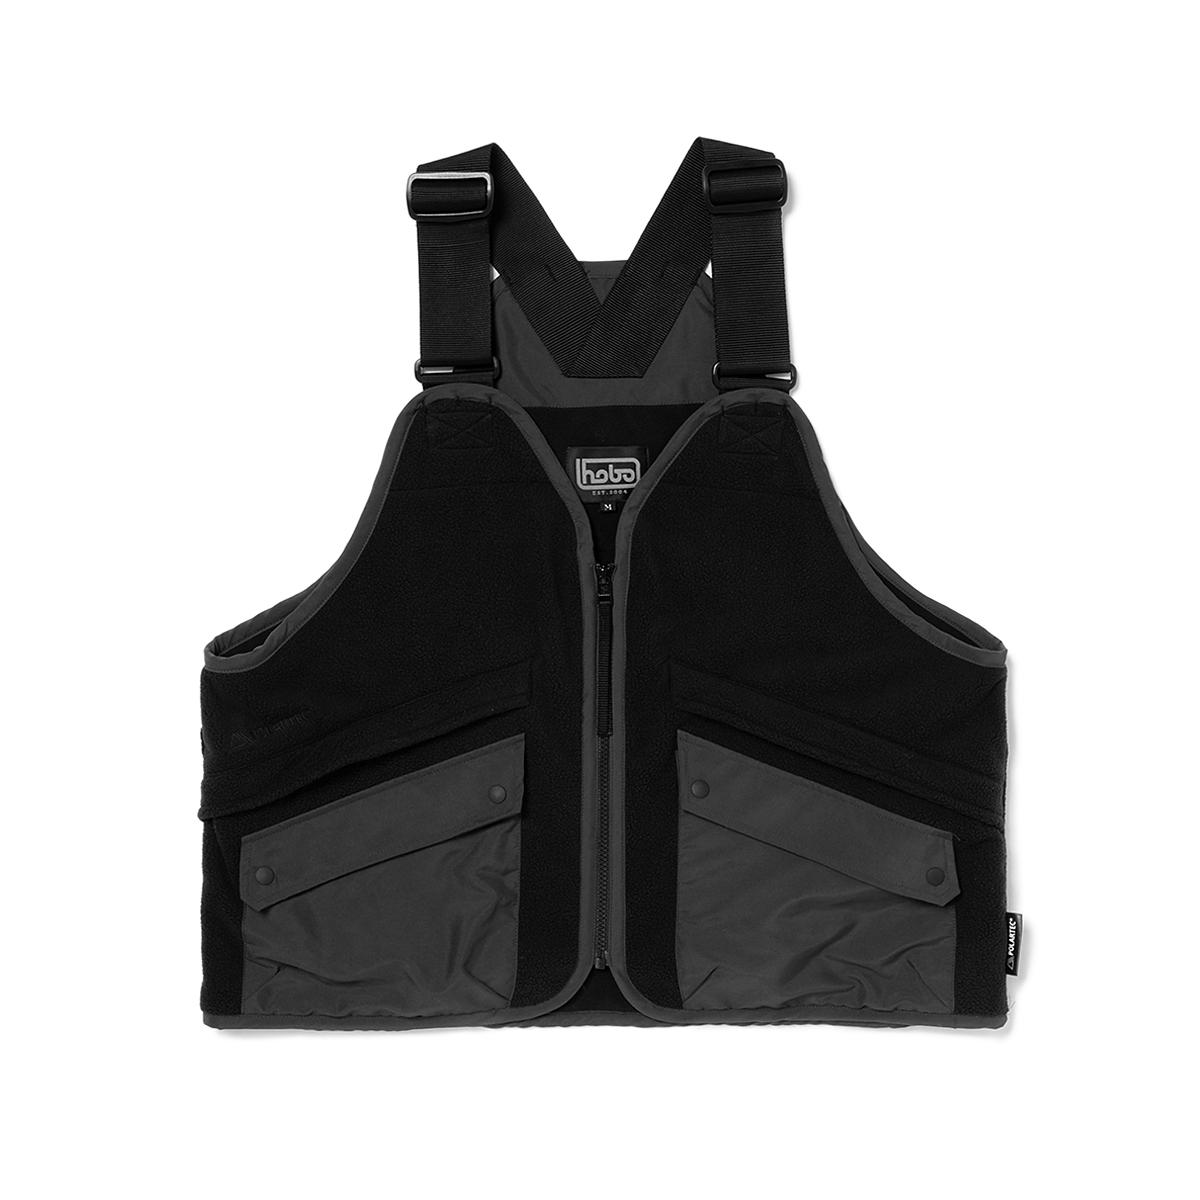 HOBO / POLARTEC® WIND PRO® Fleece Vest (Black)